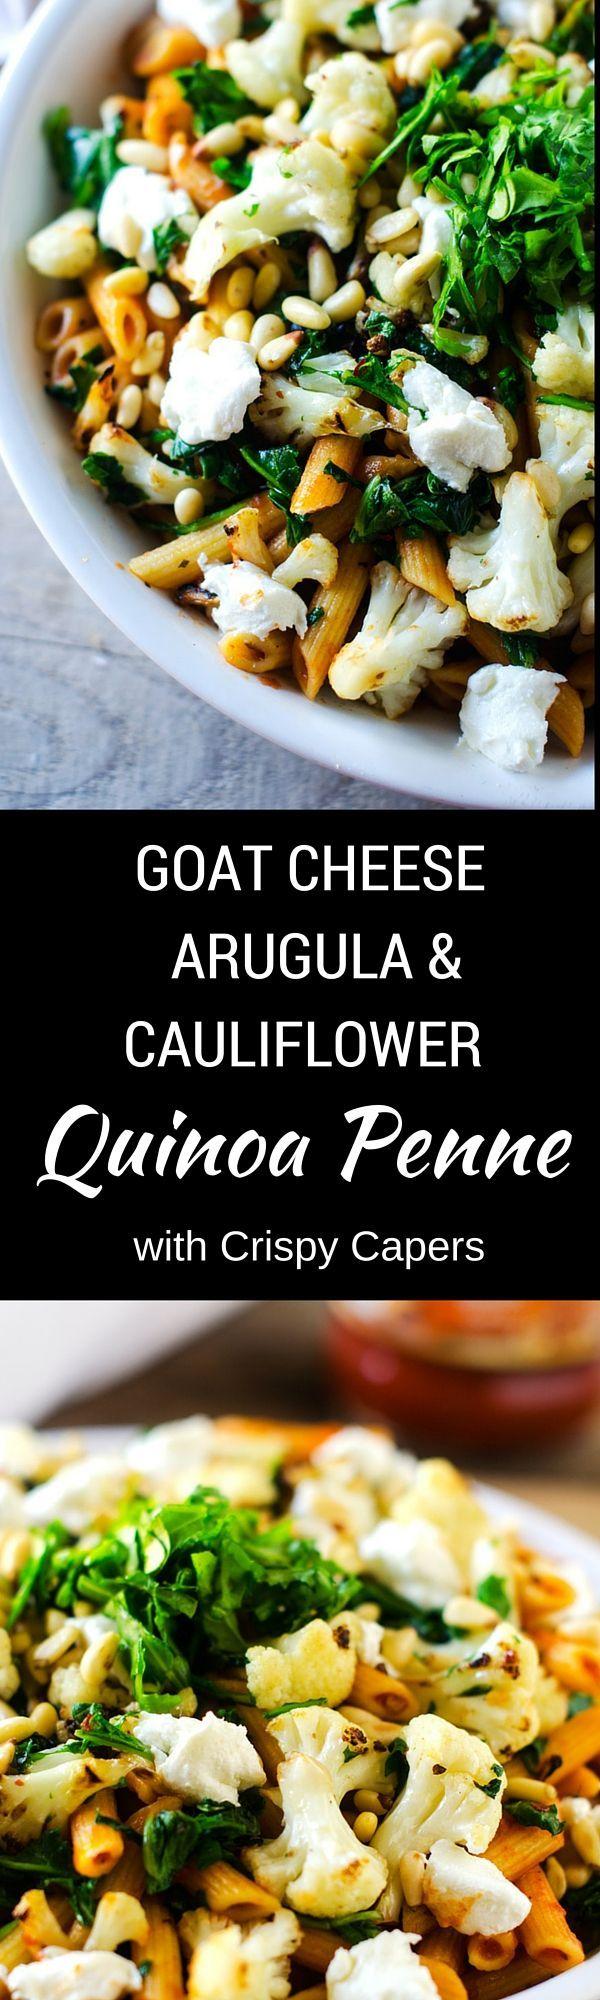 Goat Cheese, Arugula & Cauliflower Quinoa Penne with Crispy Capers - # ...